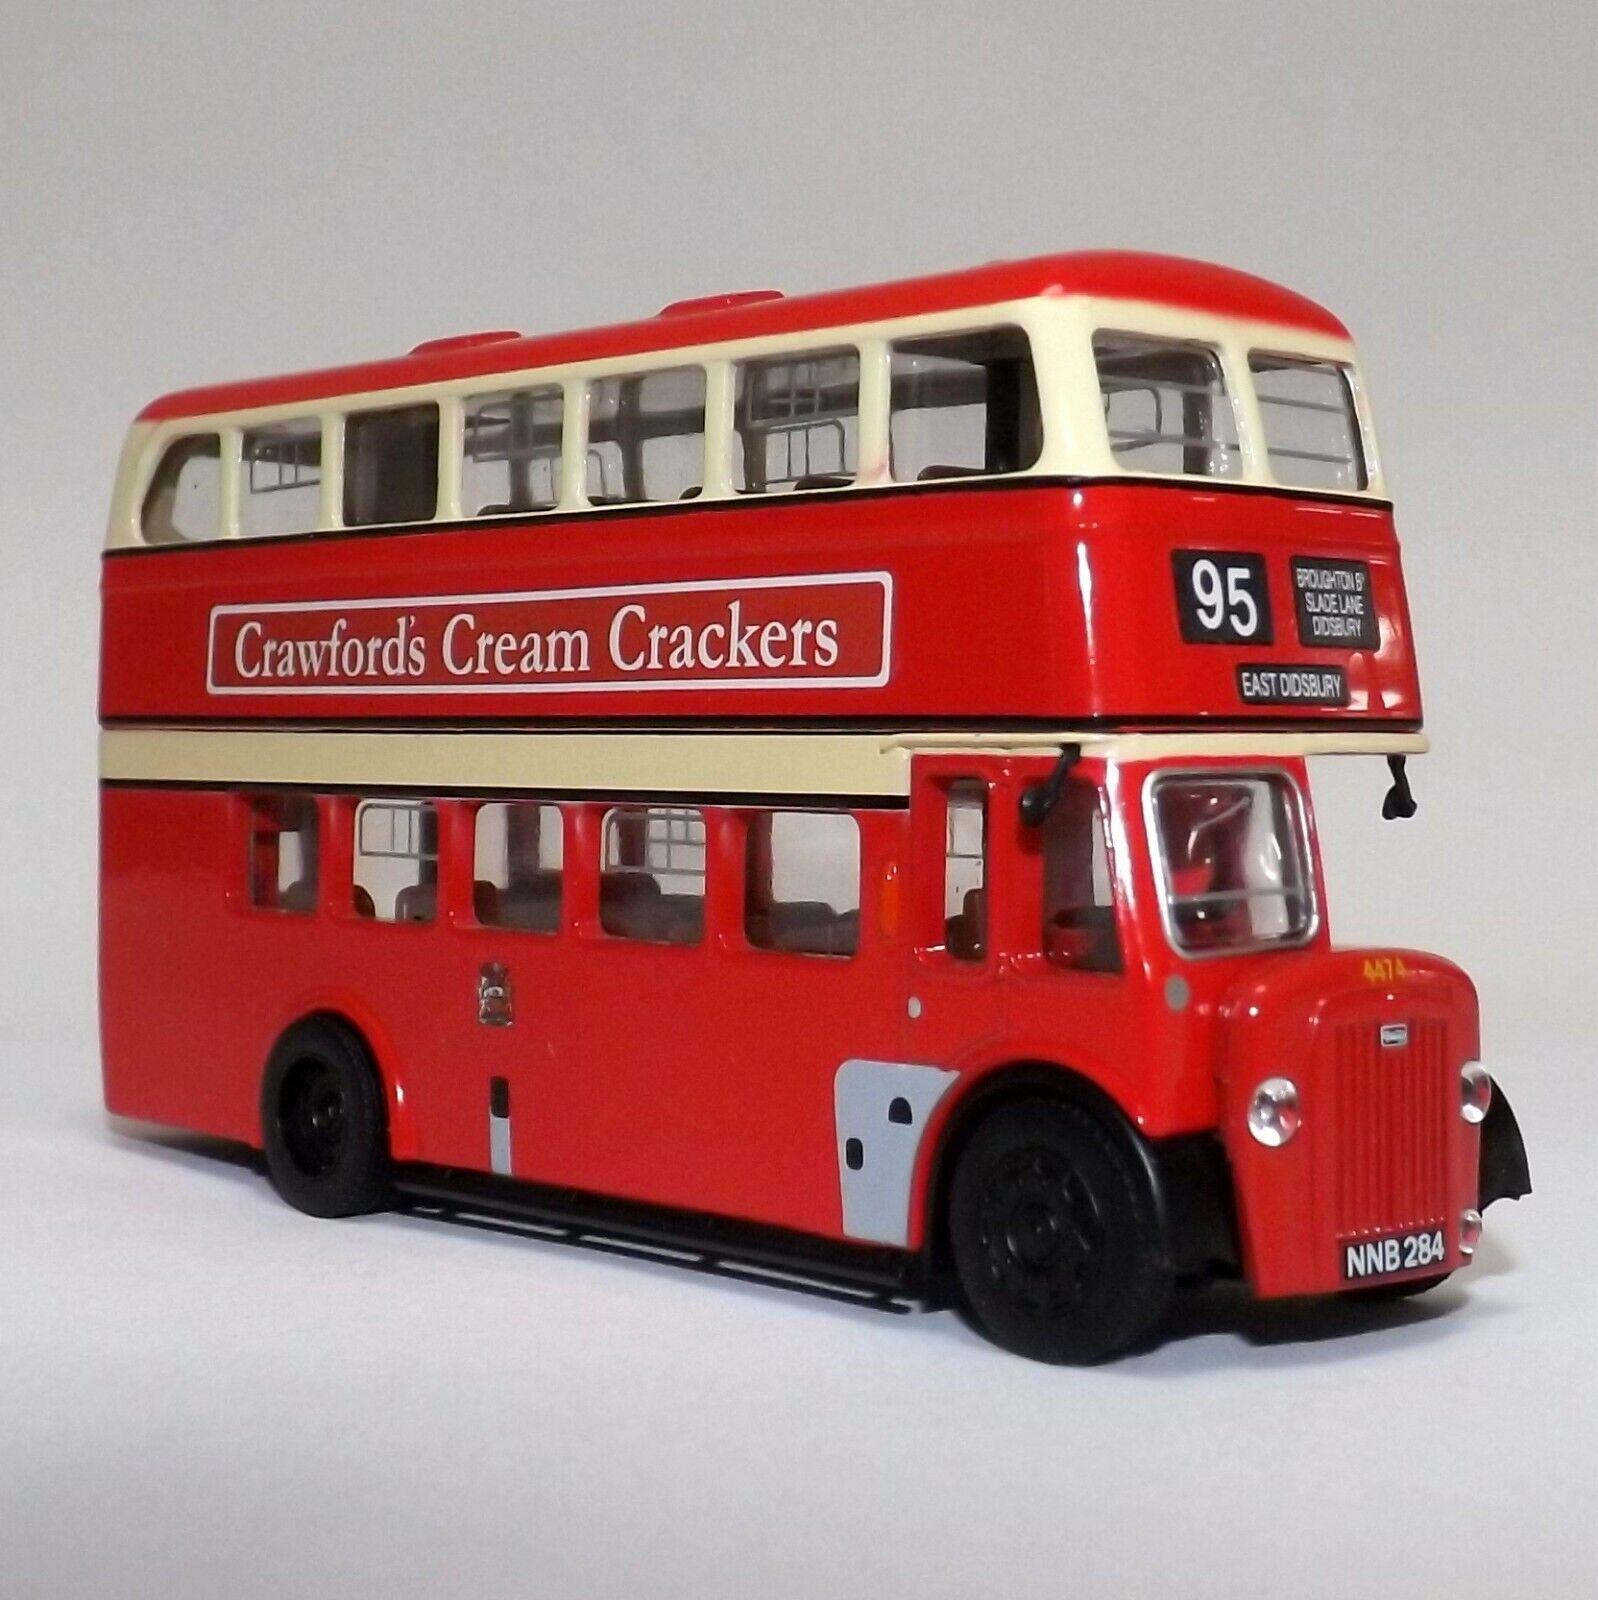 nueva gama alta exclusiva Souvenir Souvenir Souvenir de Manchester Modelo 1950s Tipo de bus RTE 95 East Didsbury por modelos hacia adelante  ofrecemos varias marcas famosas